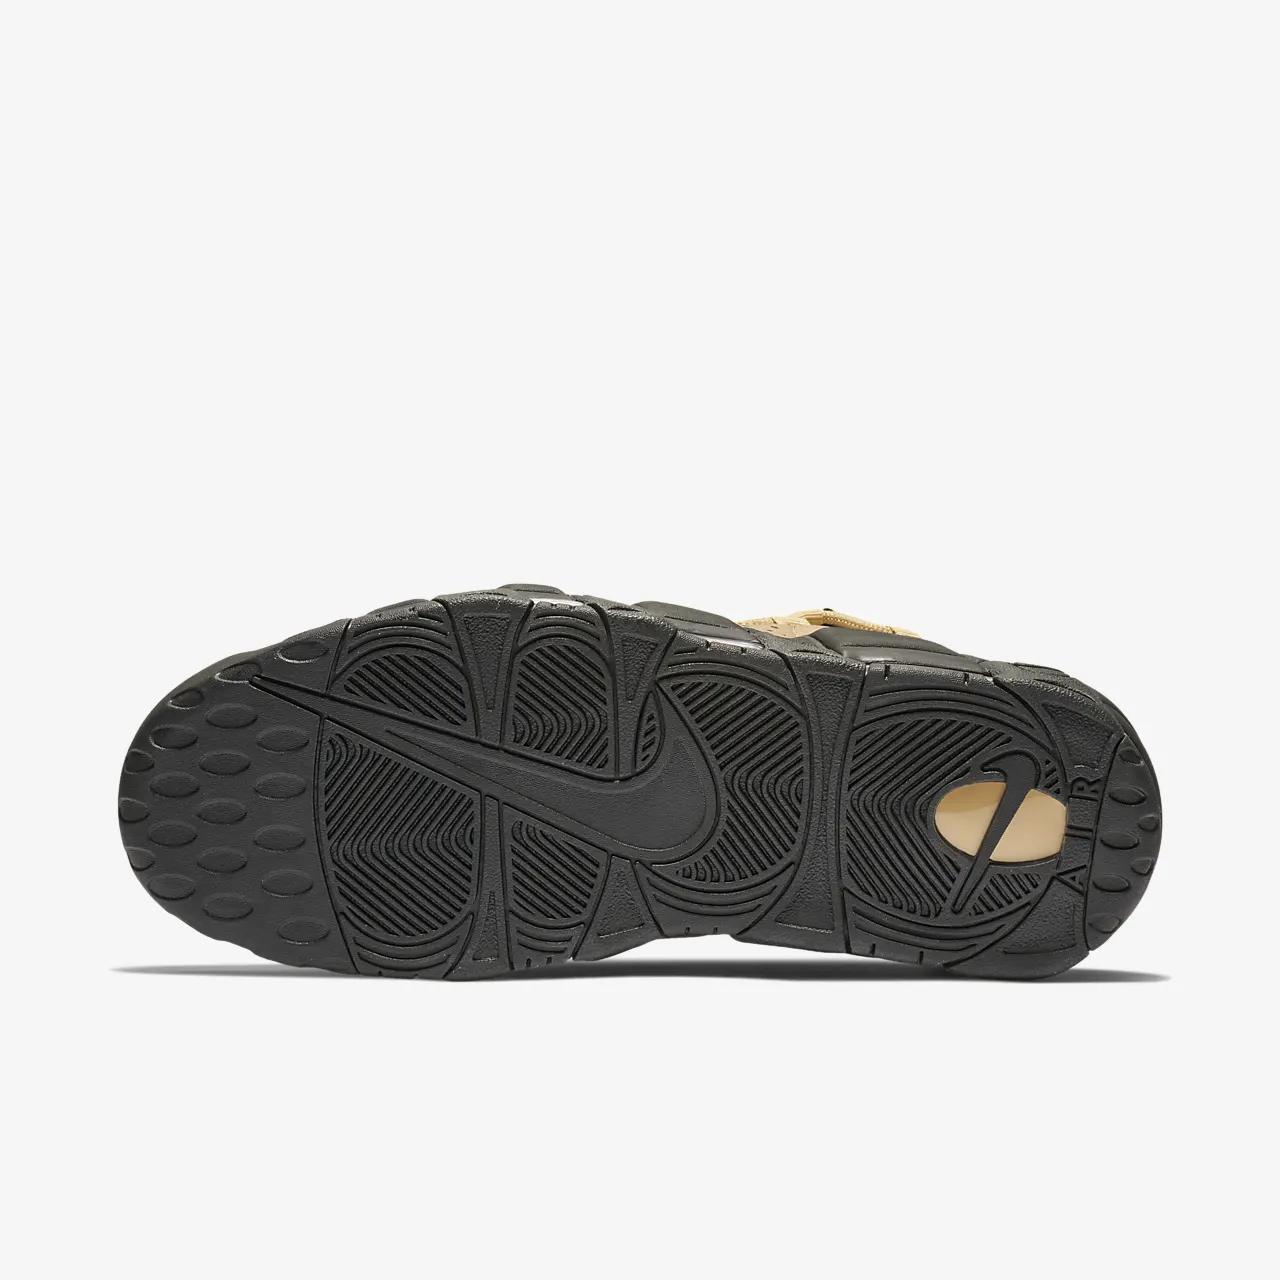 Nike Air More Money Men's Shoe AJ2998-700